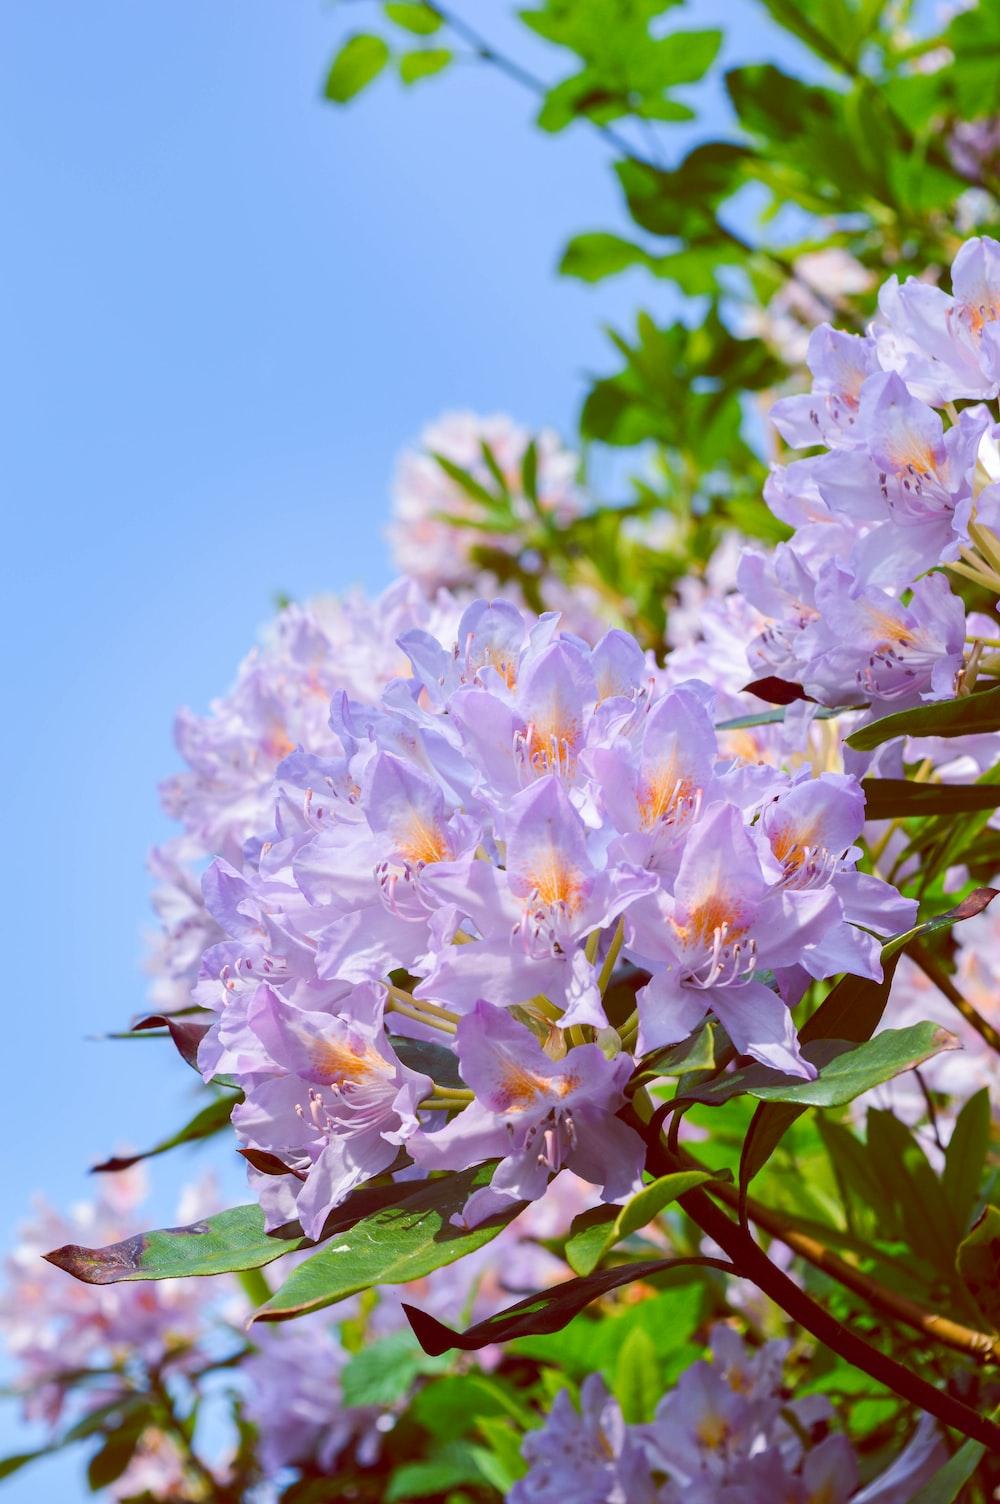 blue-petal flowers